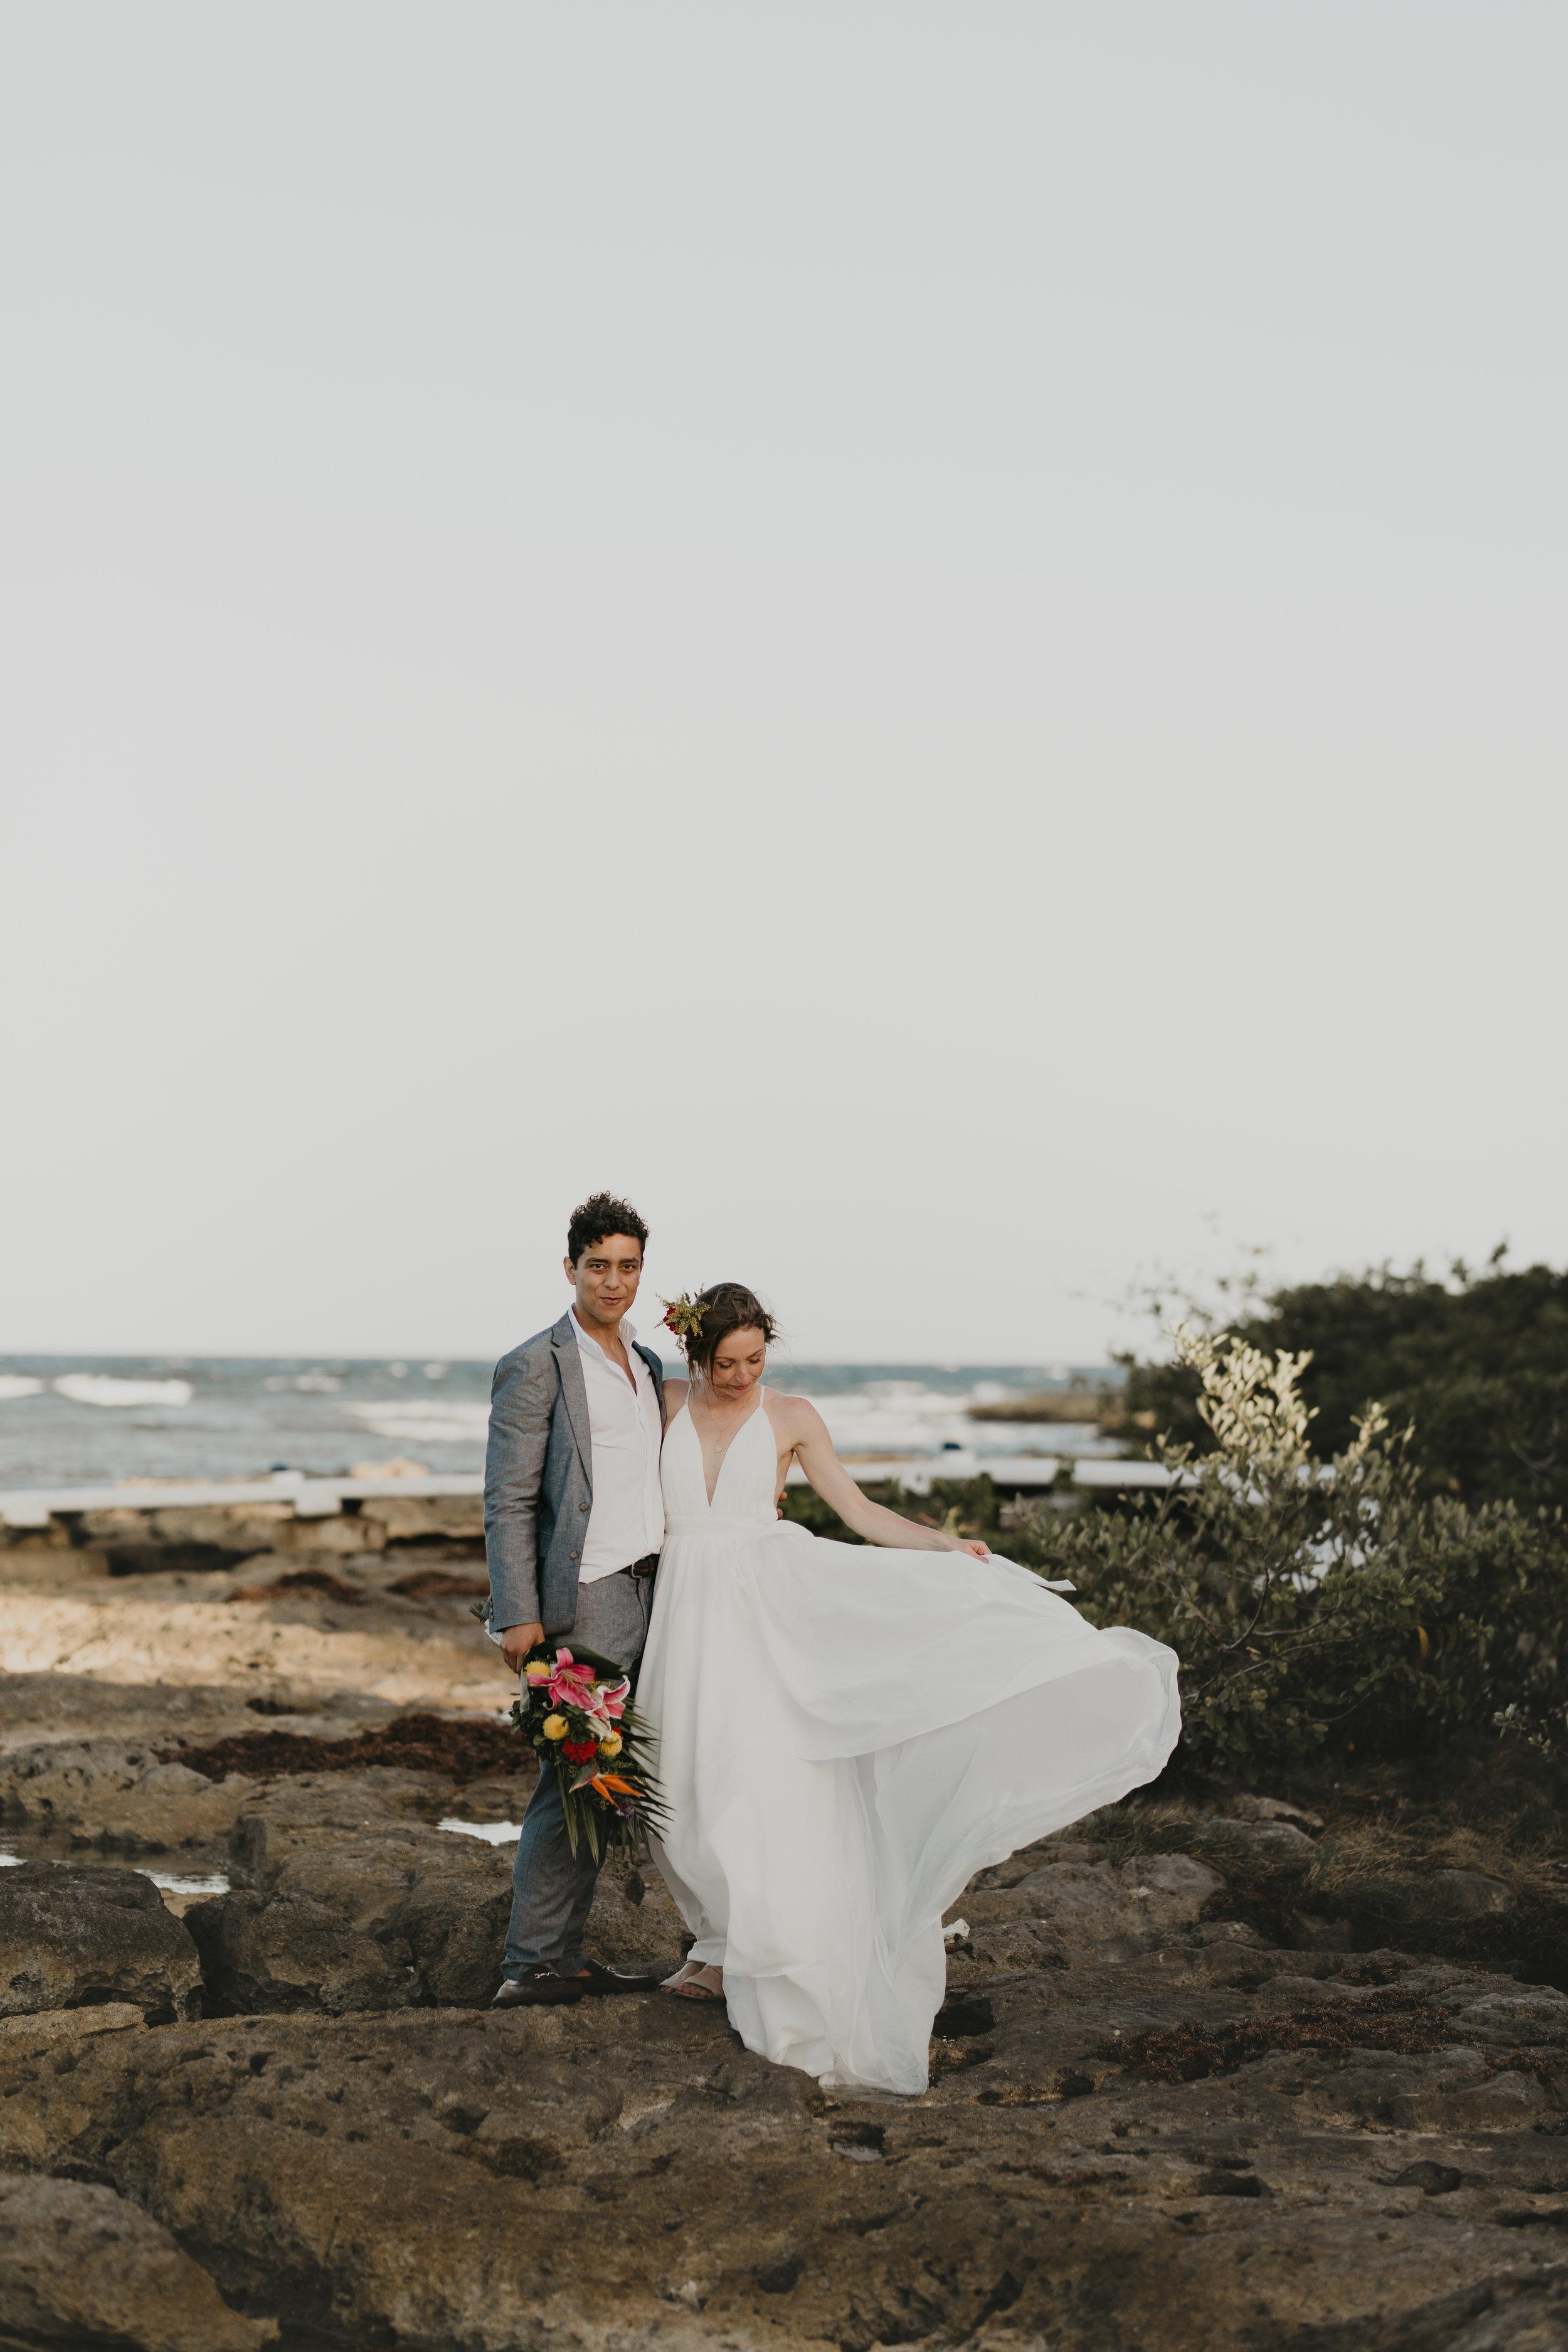 Nicole-Daacke-Photography-beachfront-akumal-destionation-wedding-tulum-mexico-elopement-photographer-destination-wedding-inspiration-sunset-champagne-pop-boho-bride-ocean-tropical-bohemian-tulum-wedding-photos-184.jpg